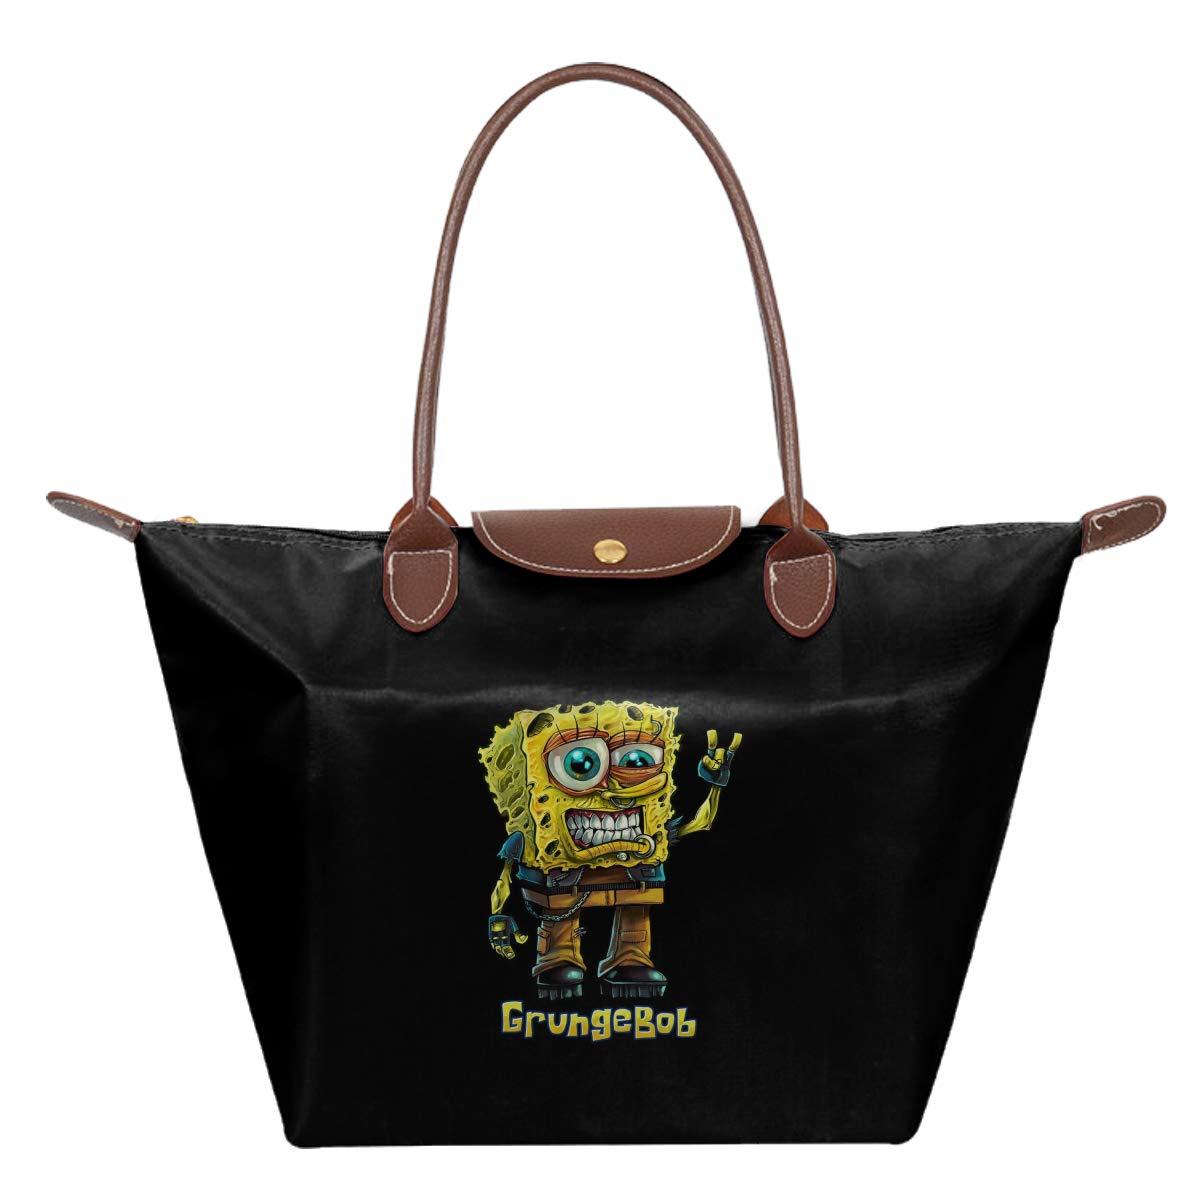 Spongebob Parody Grungebob Waterproof Leather Folded Messenger Nylon Bag Travel Tote Hopping Folding School Handbags